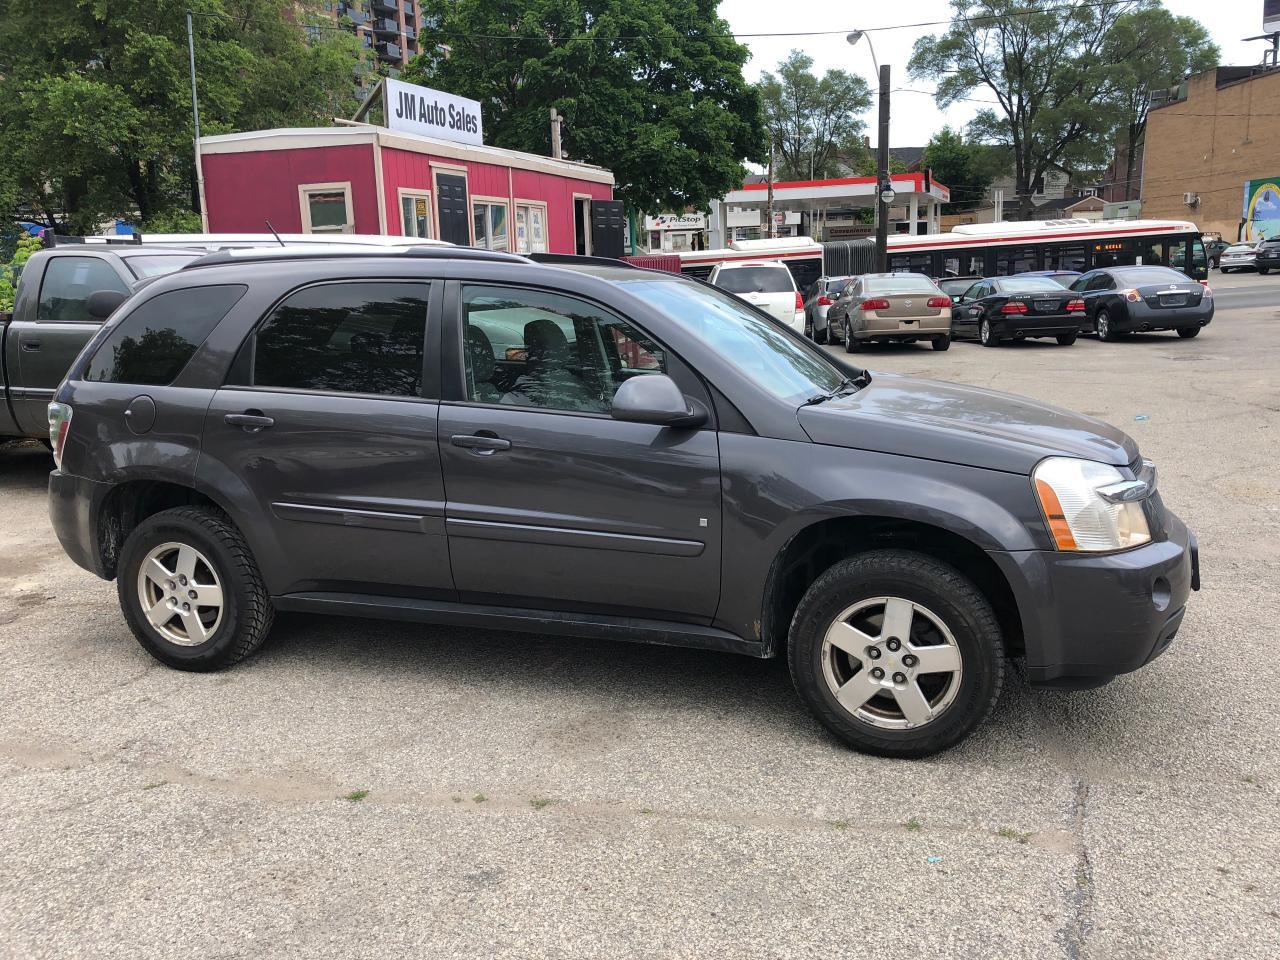 Photo of Gray 2007 Chevrolet Equinox